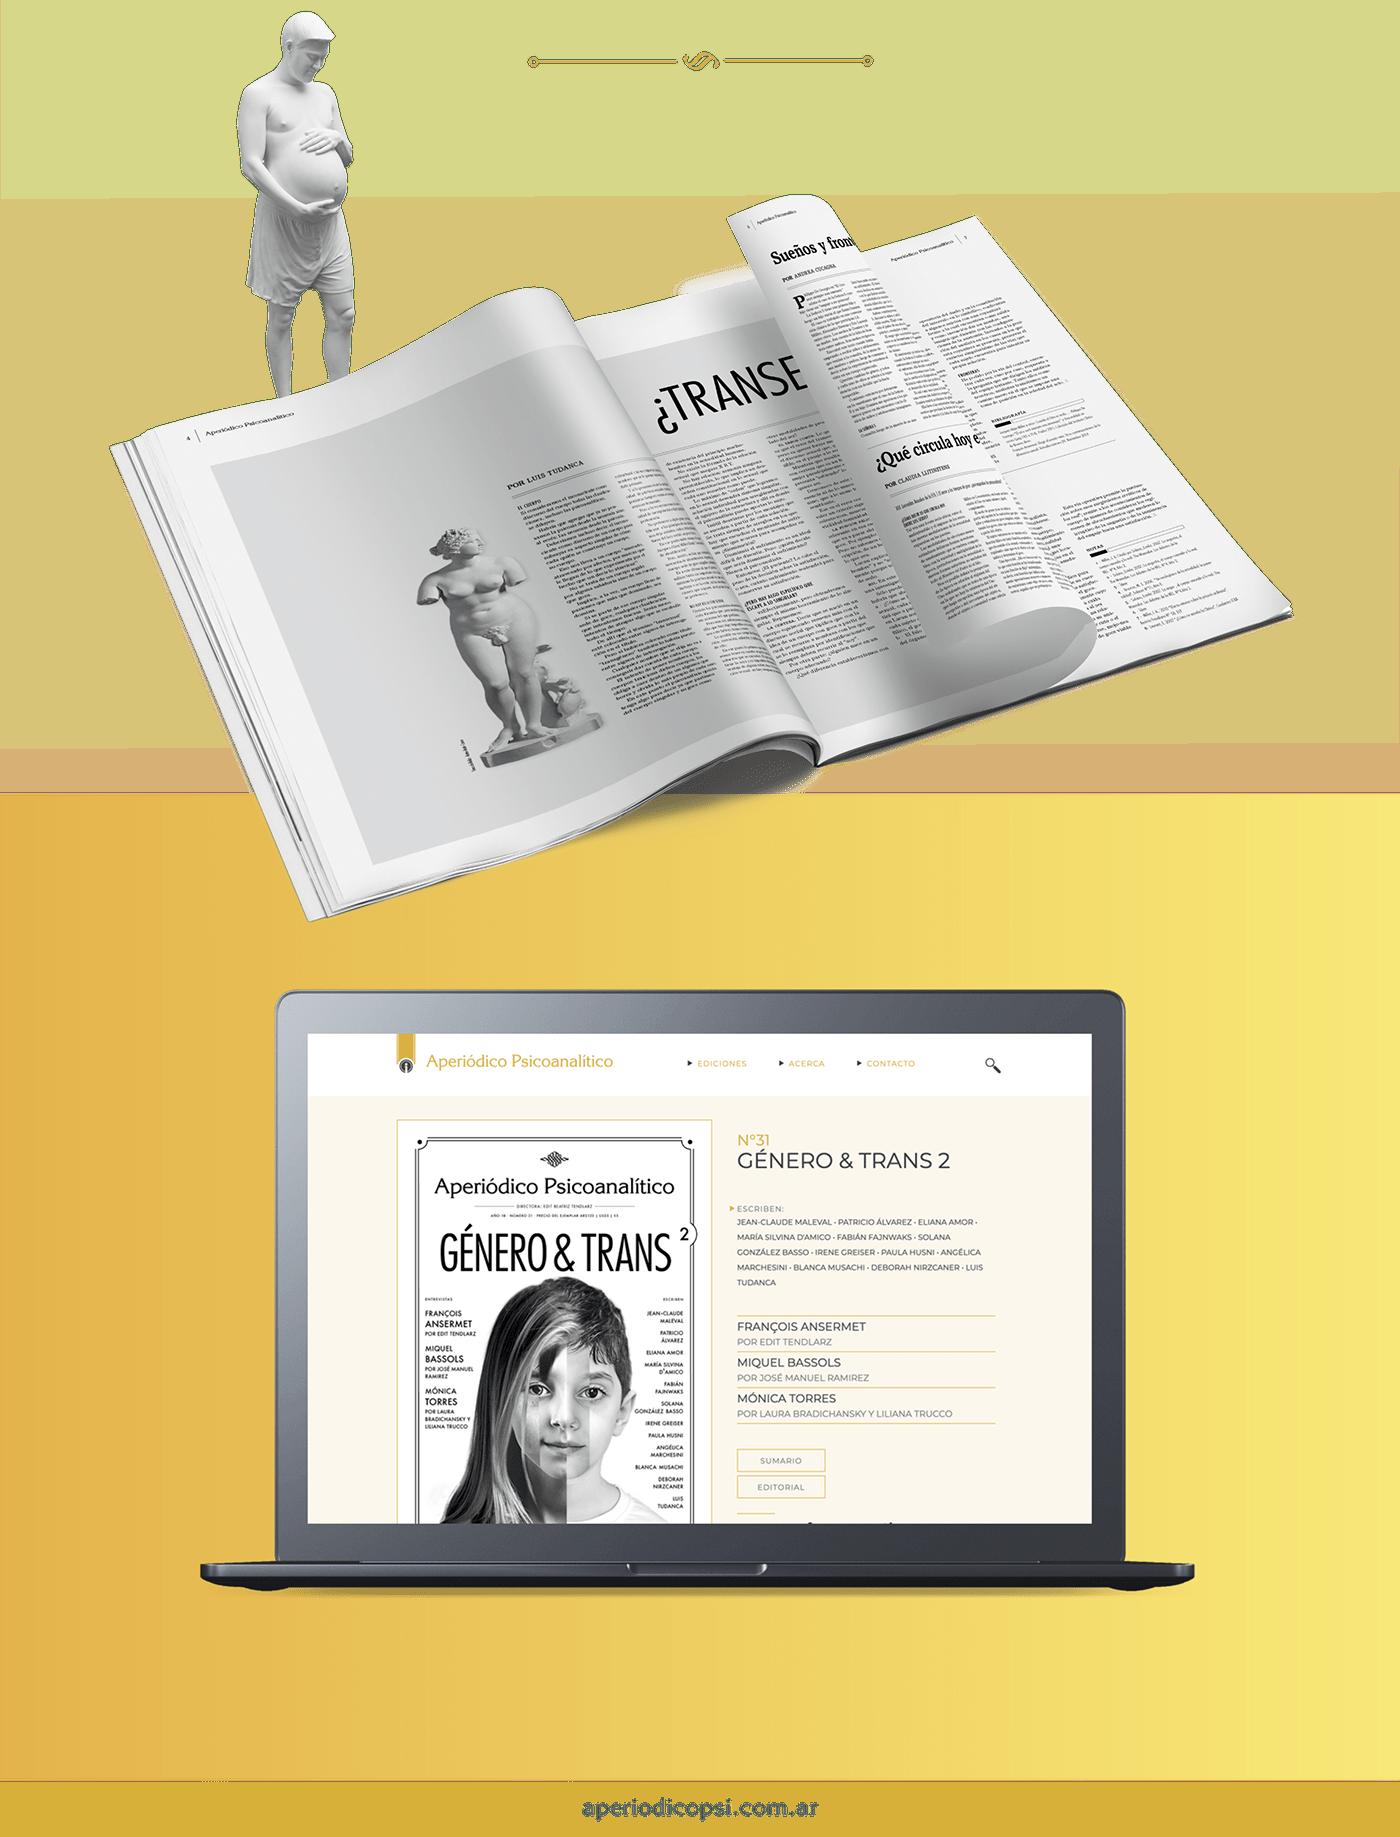 Psicoanalisis periodico magazine newspaper